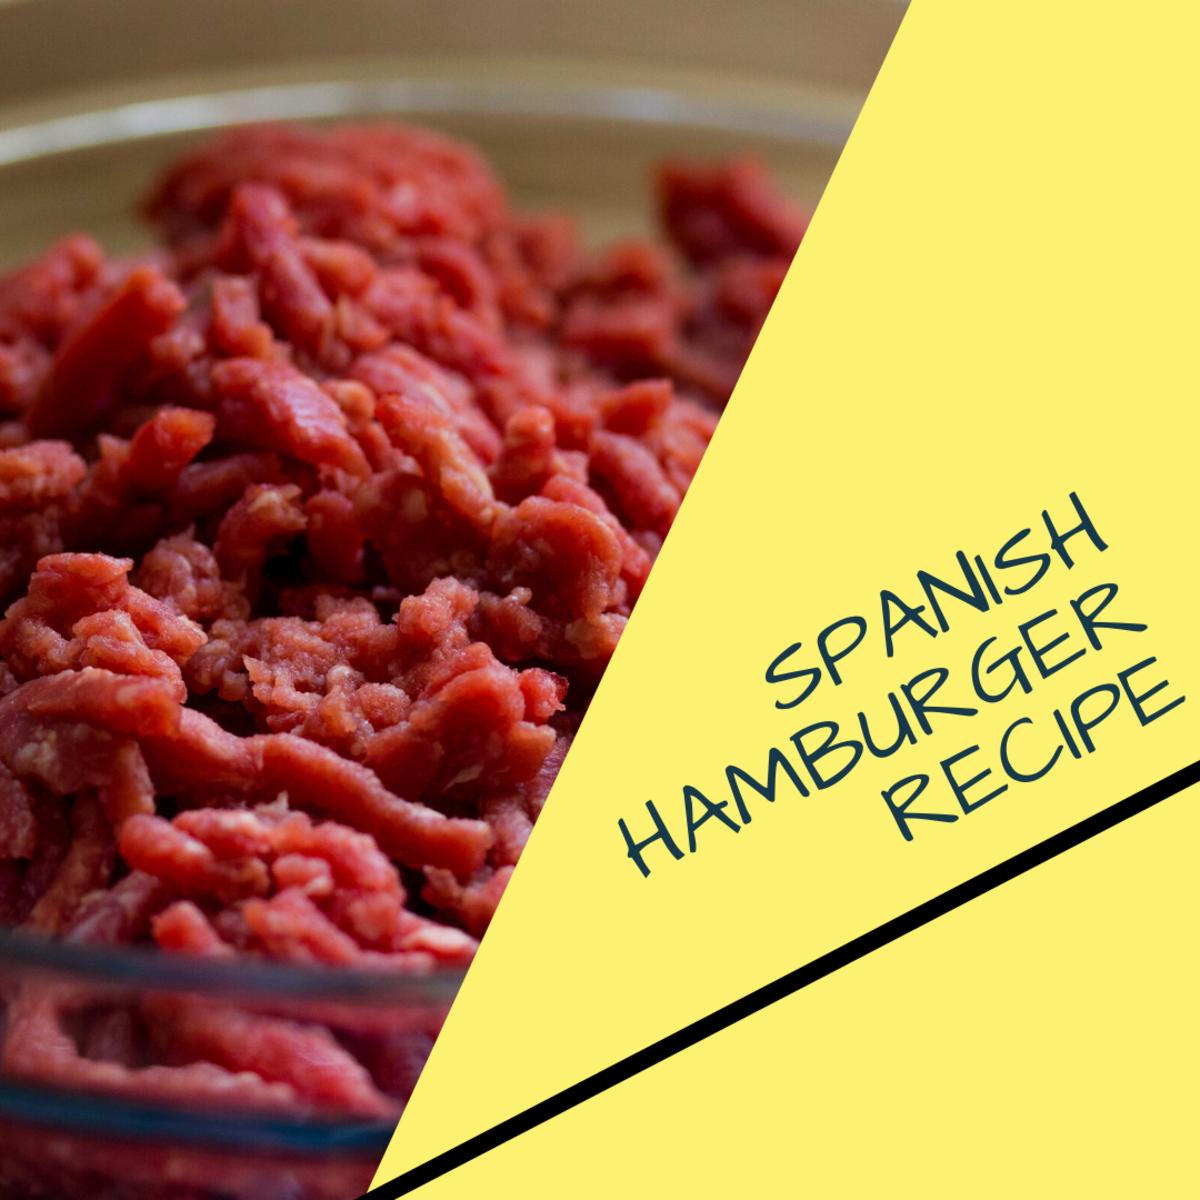 Easy 80-Year-Old Heirloom Spanish Hamburger Recipe